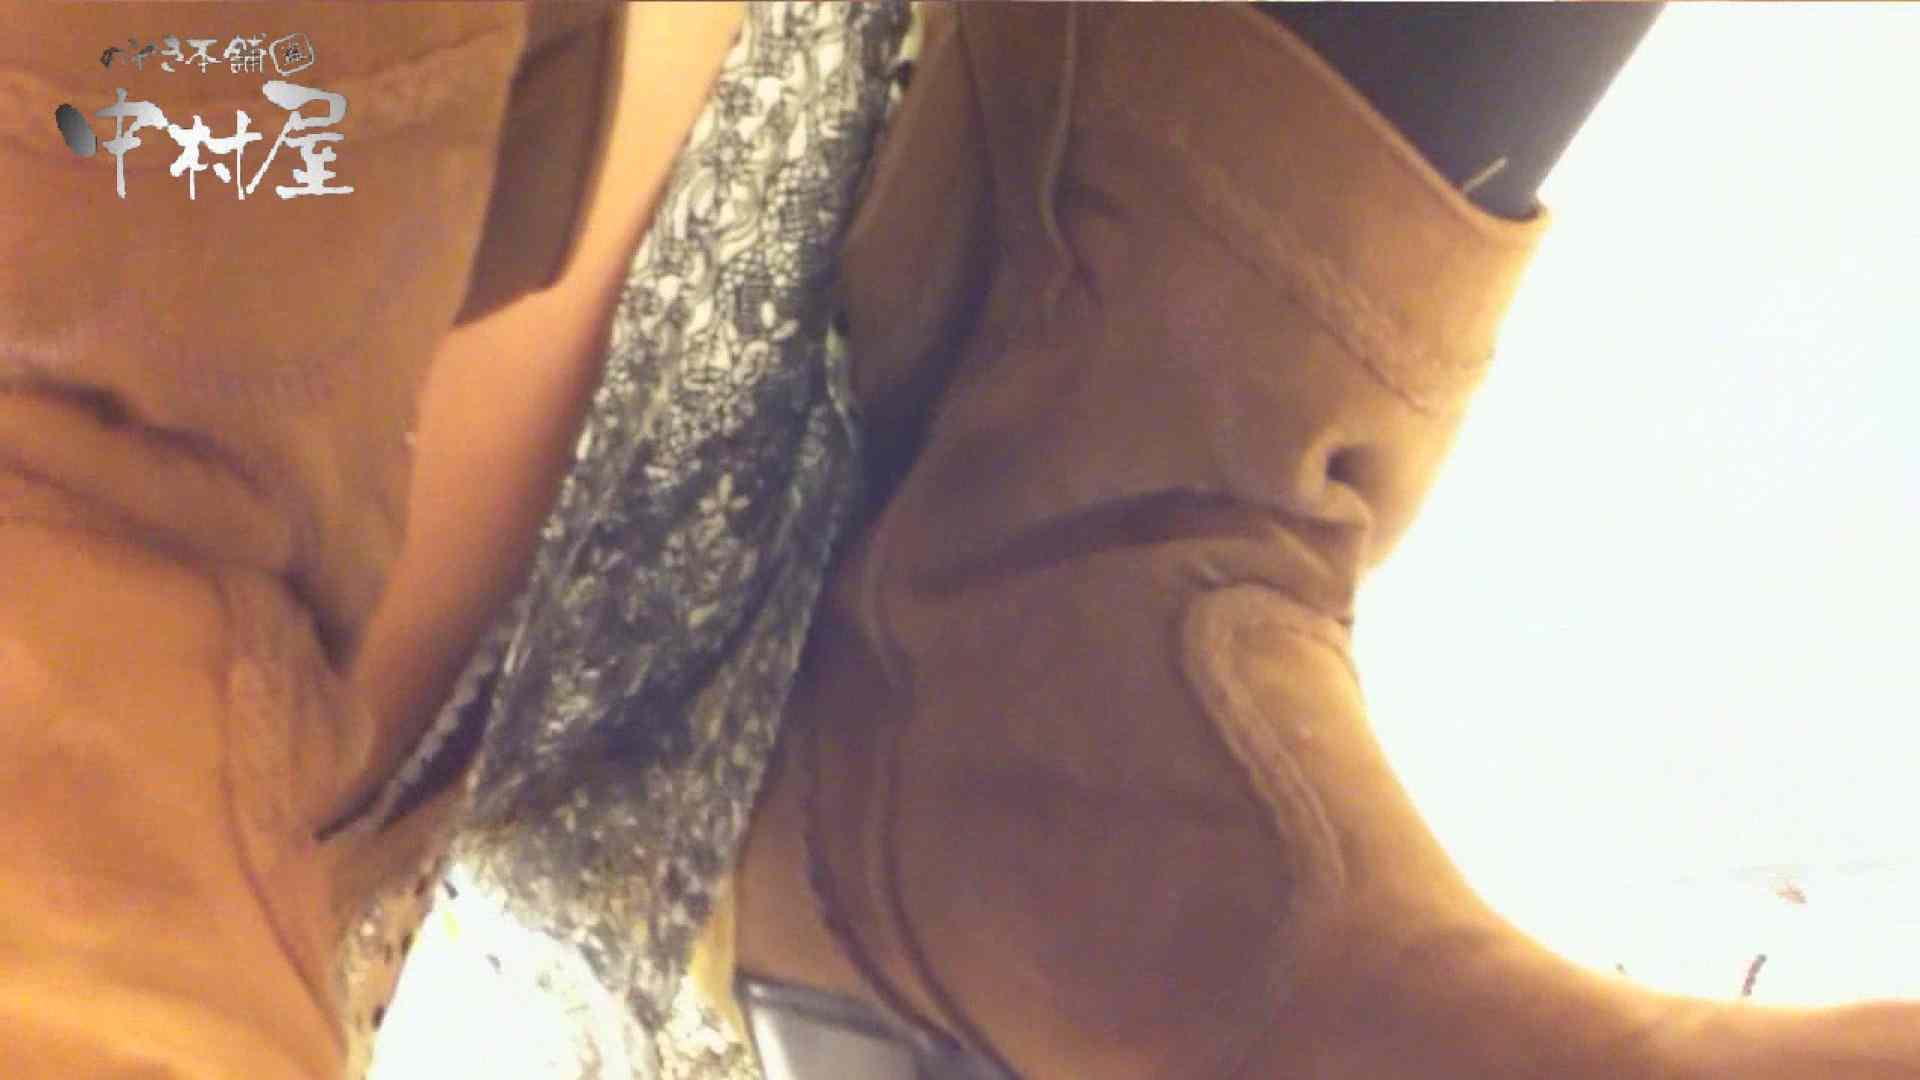 vol.66 美人アパレル胸チラ&パンチラ 店員さんのパンツはストライプ 美人 ワレメ動画紹介 75連発 69